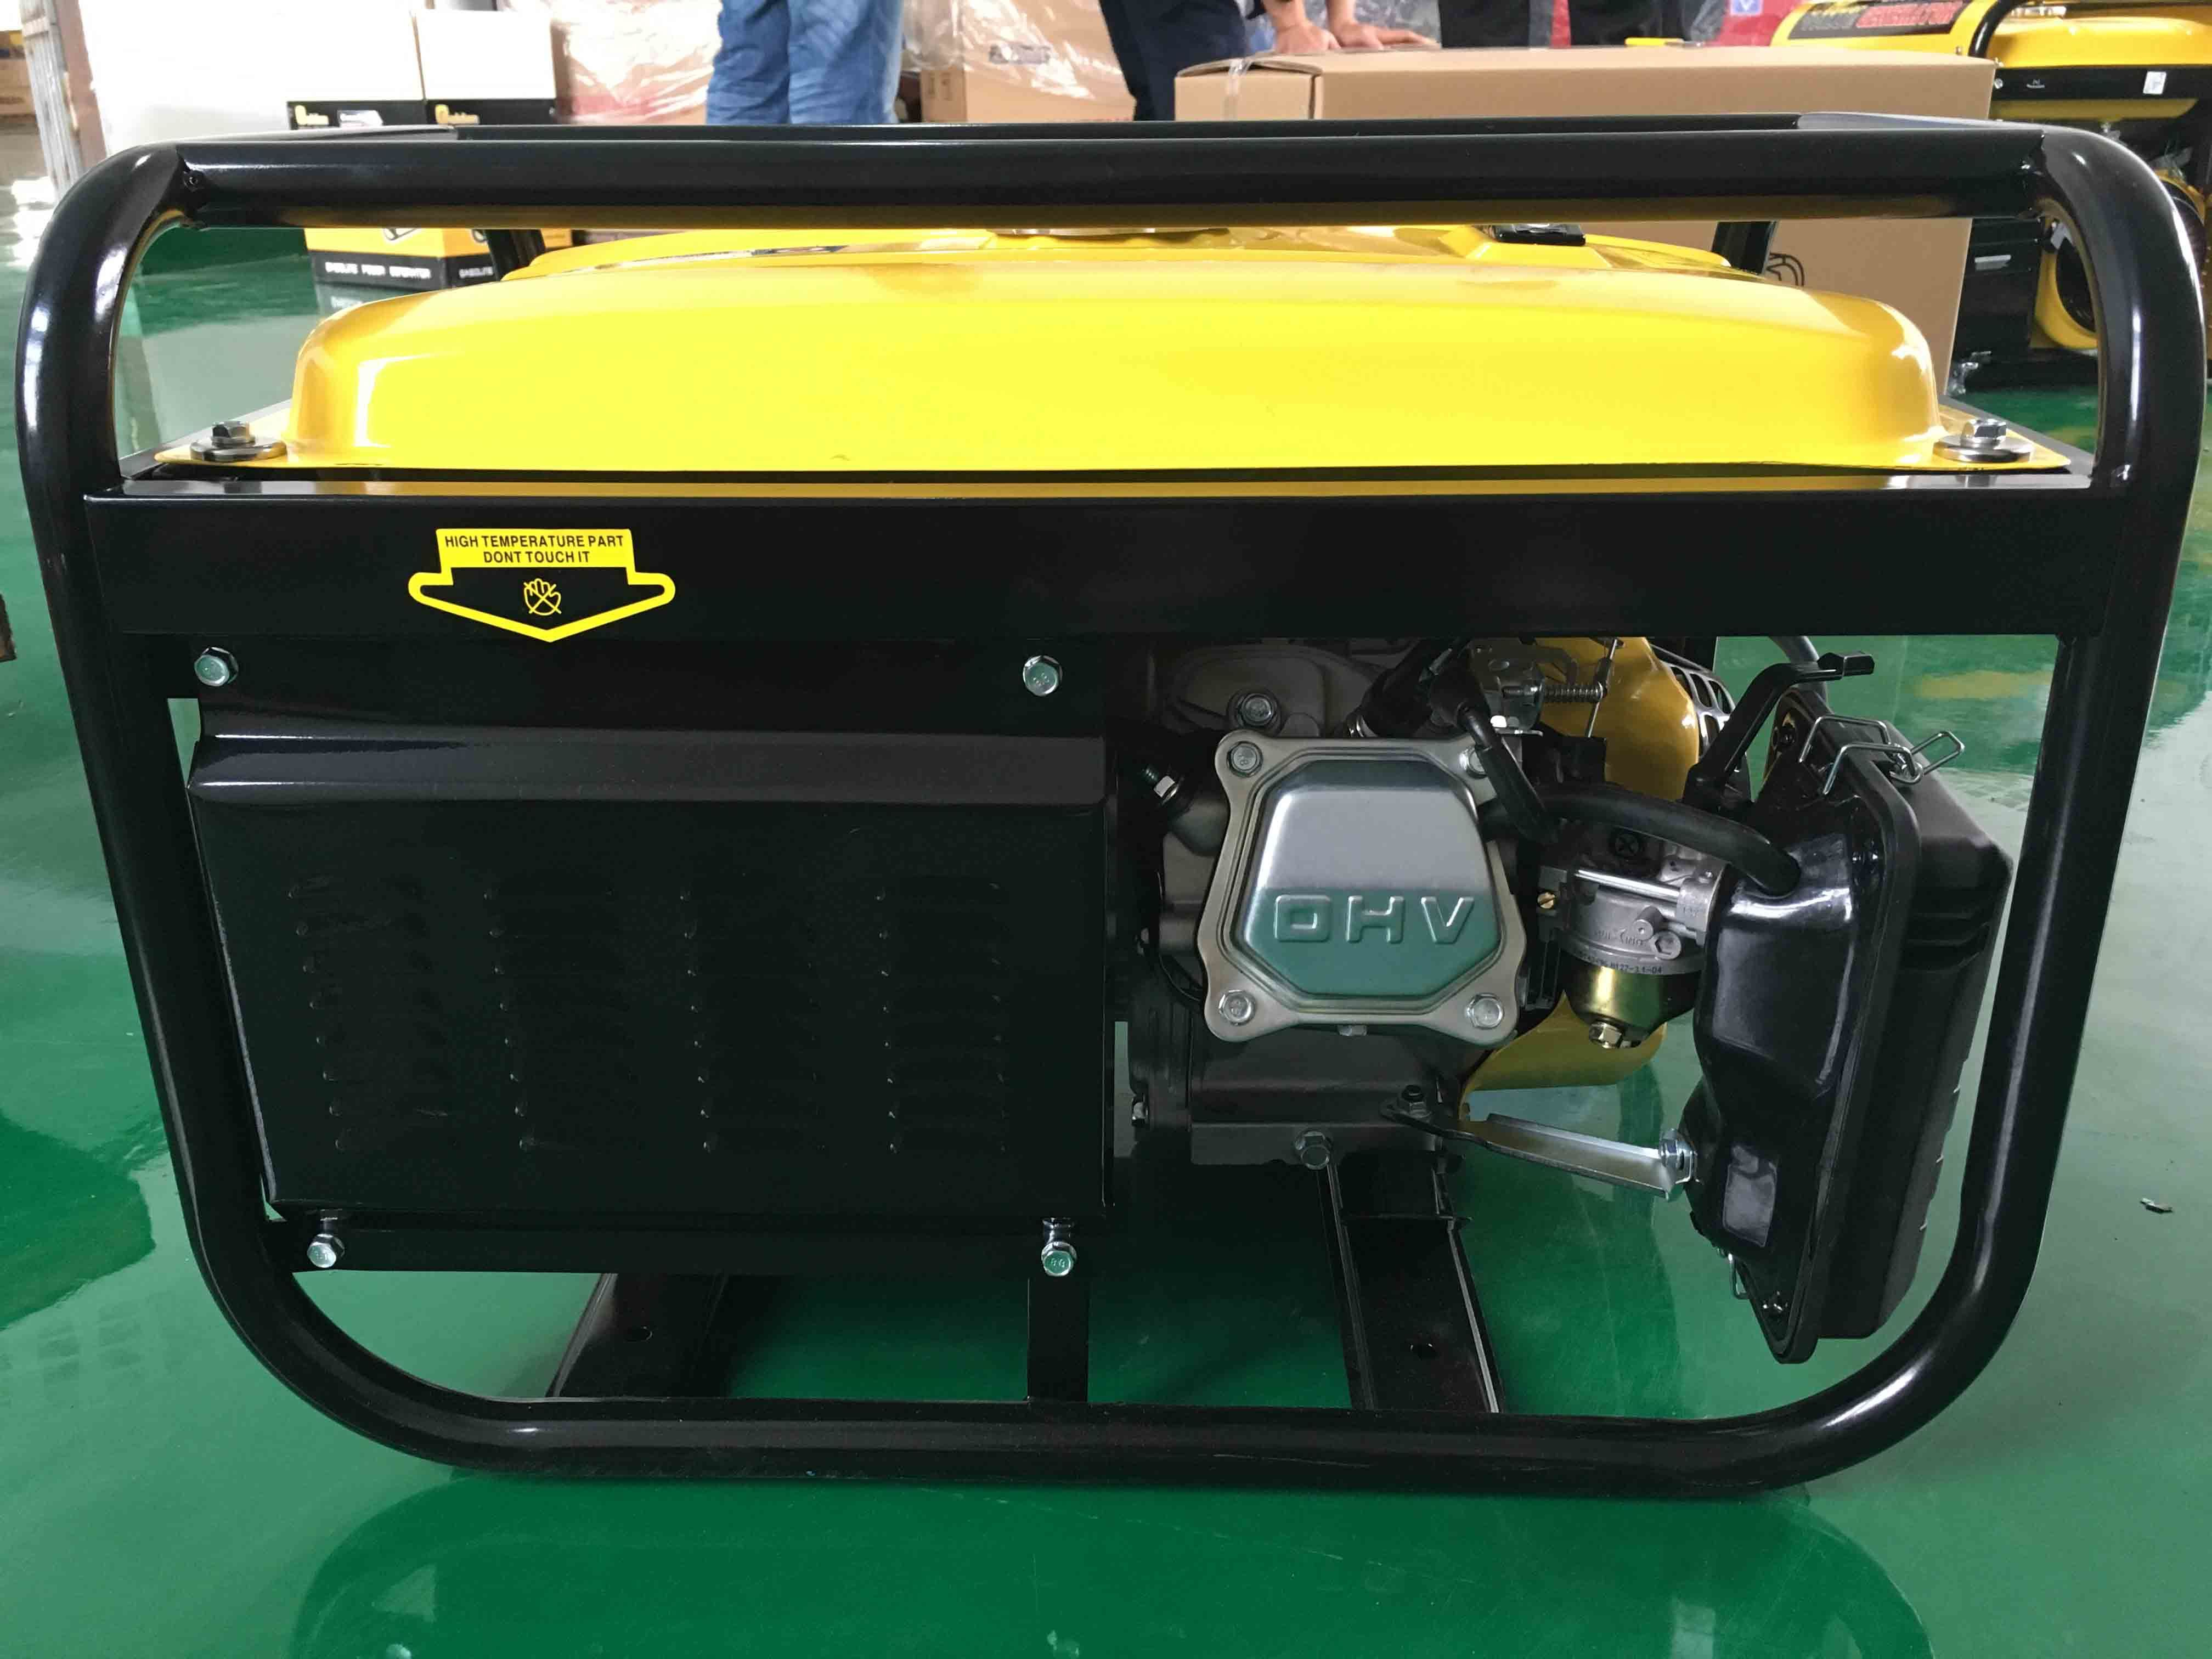 3kw 3000W Copper Wire Portable Electric Power Gasoline Generator